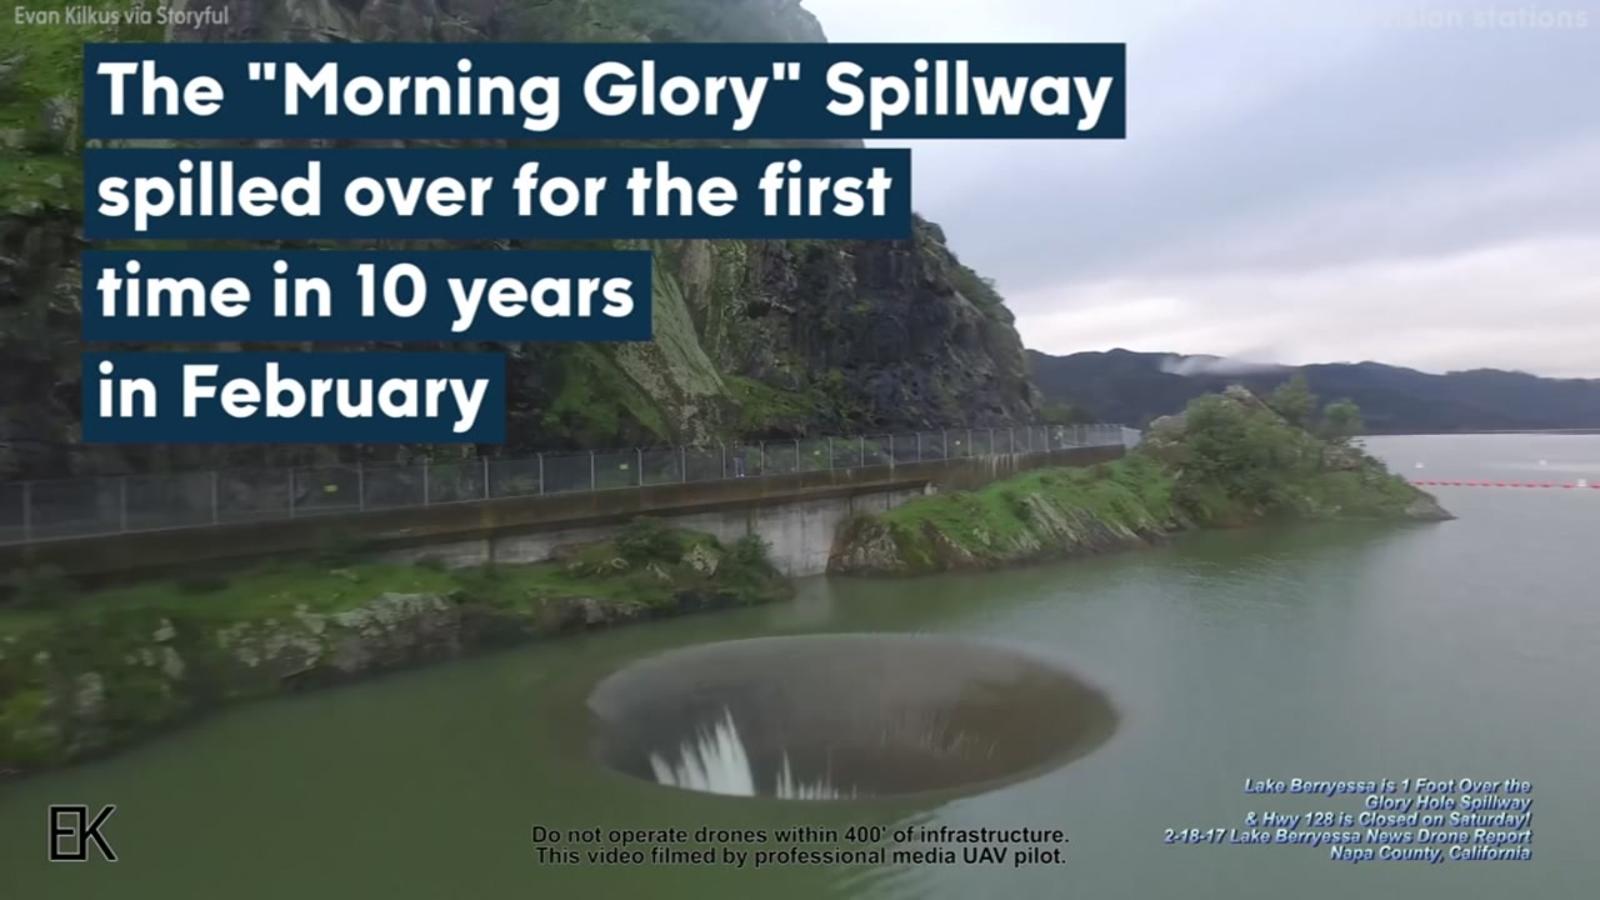 Glory hole inland empire